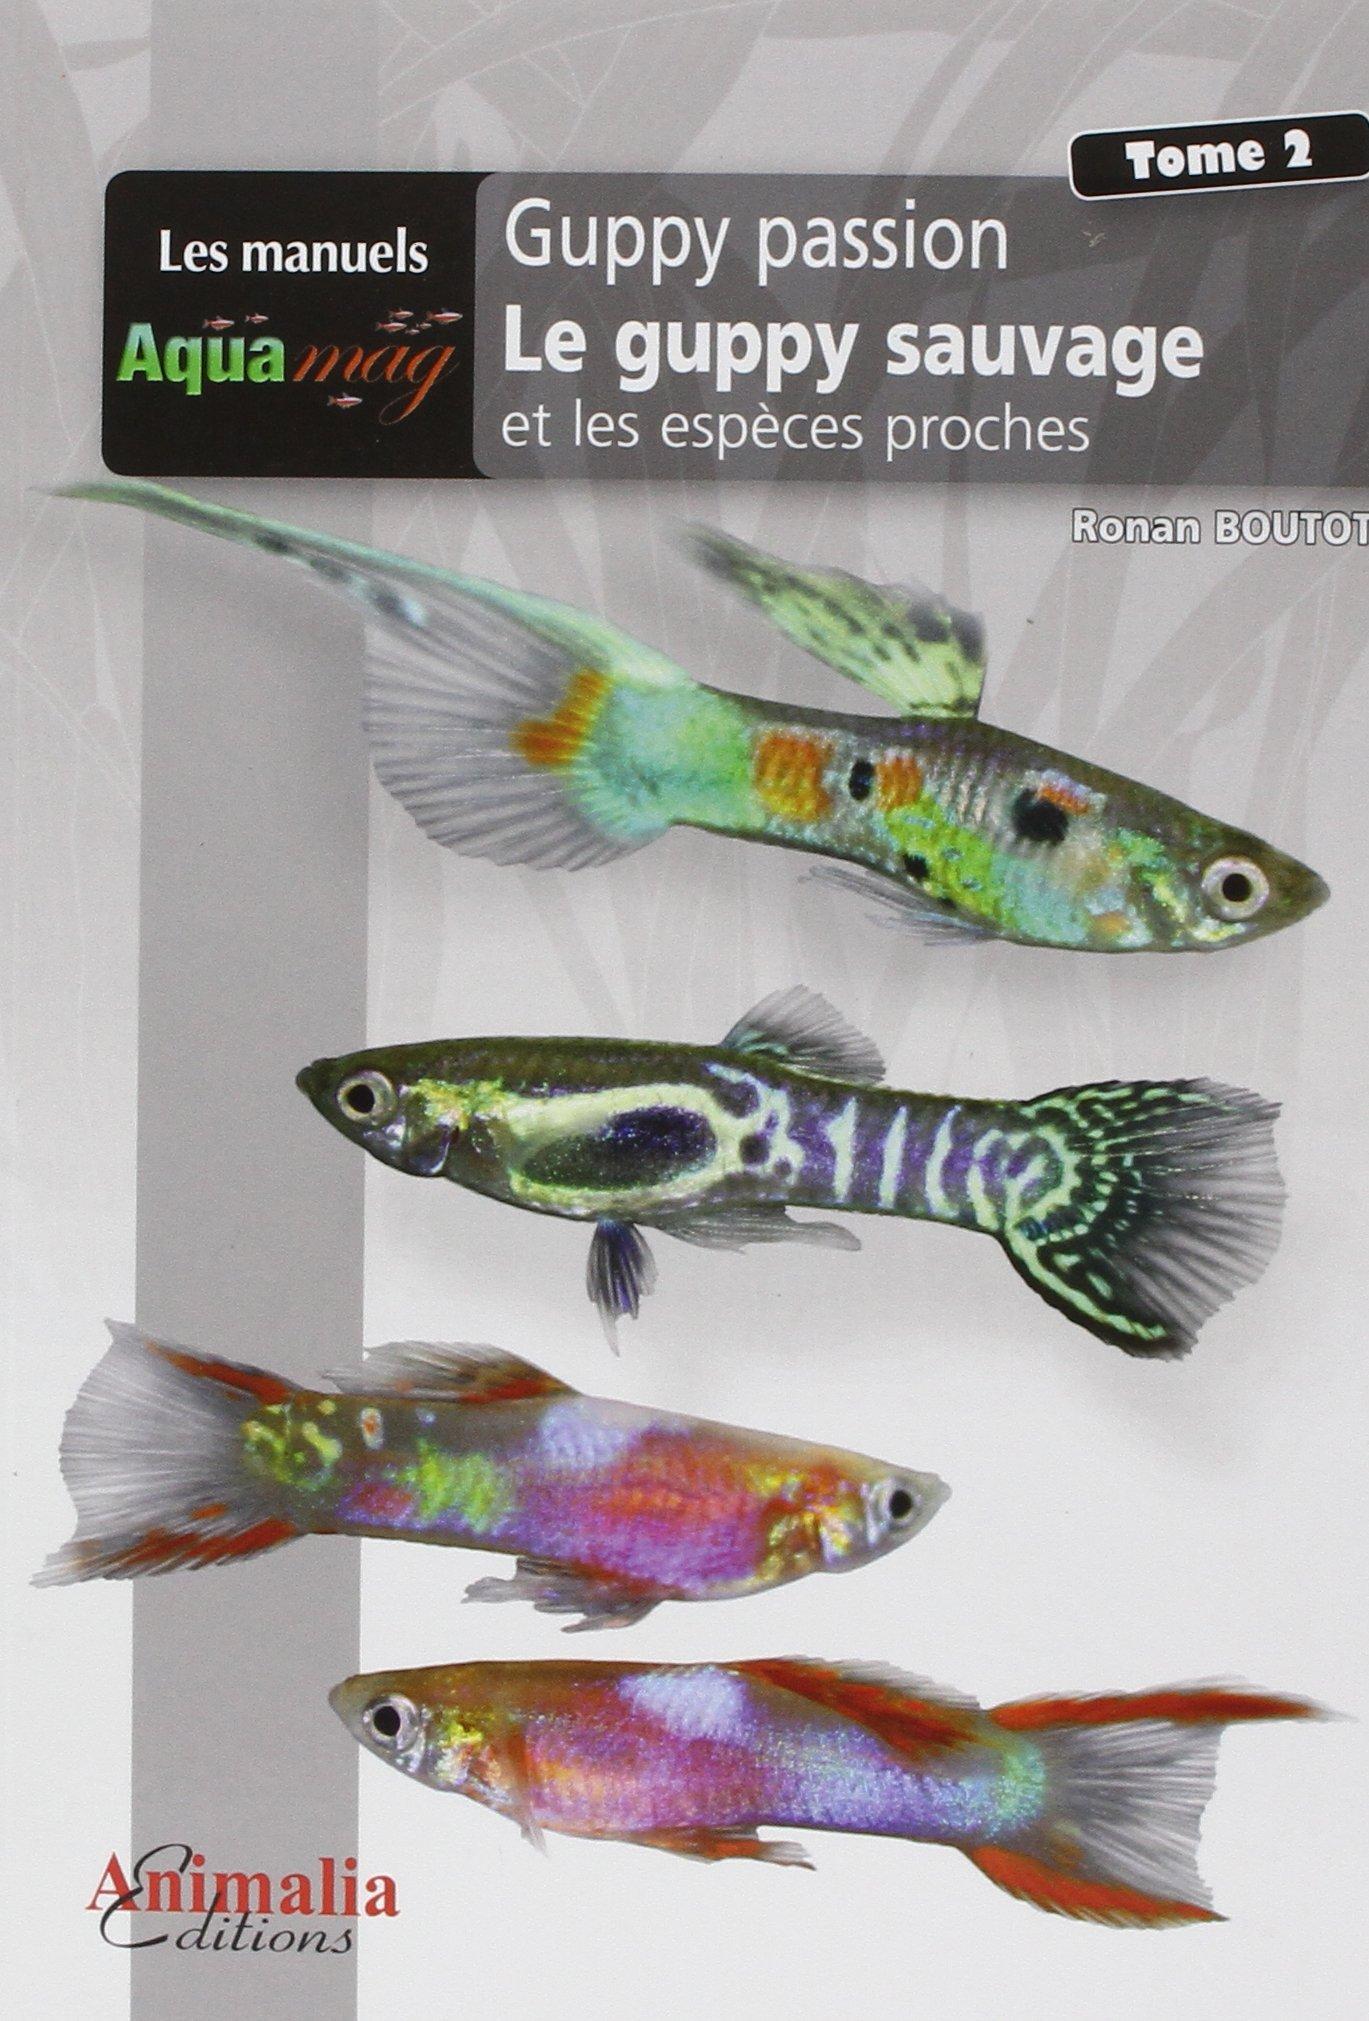 Guppy passion : Volume 2 Broché – 10 octobre 2017 Ronan Boutot Animalia Editions 2359090747 Loisirs / Jardins et Nature